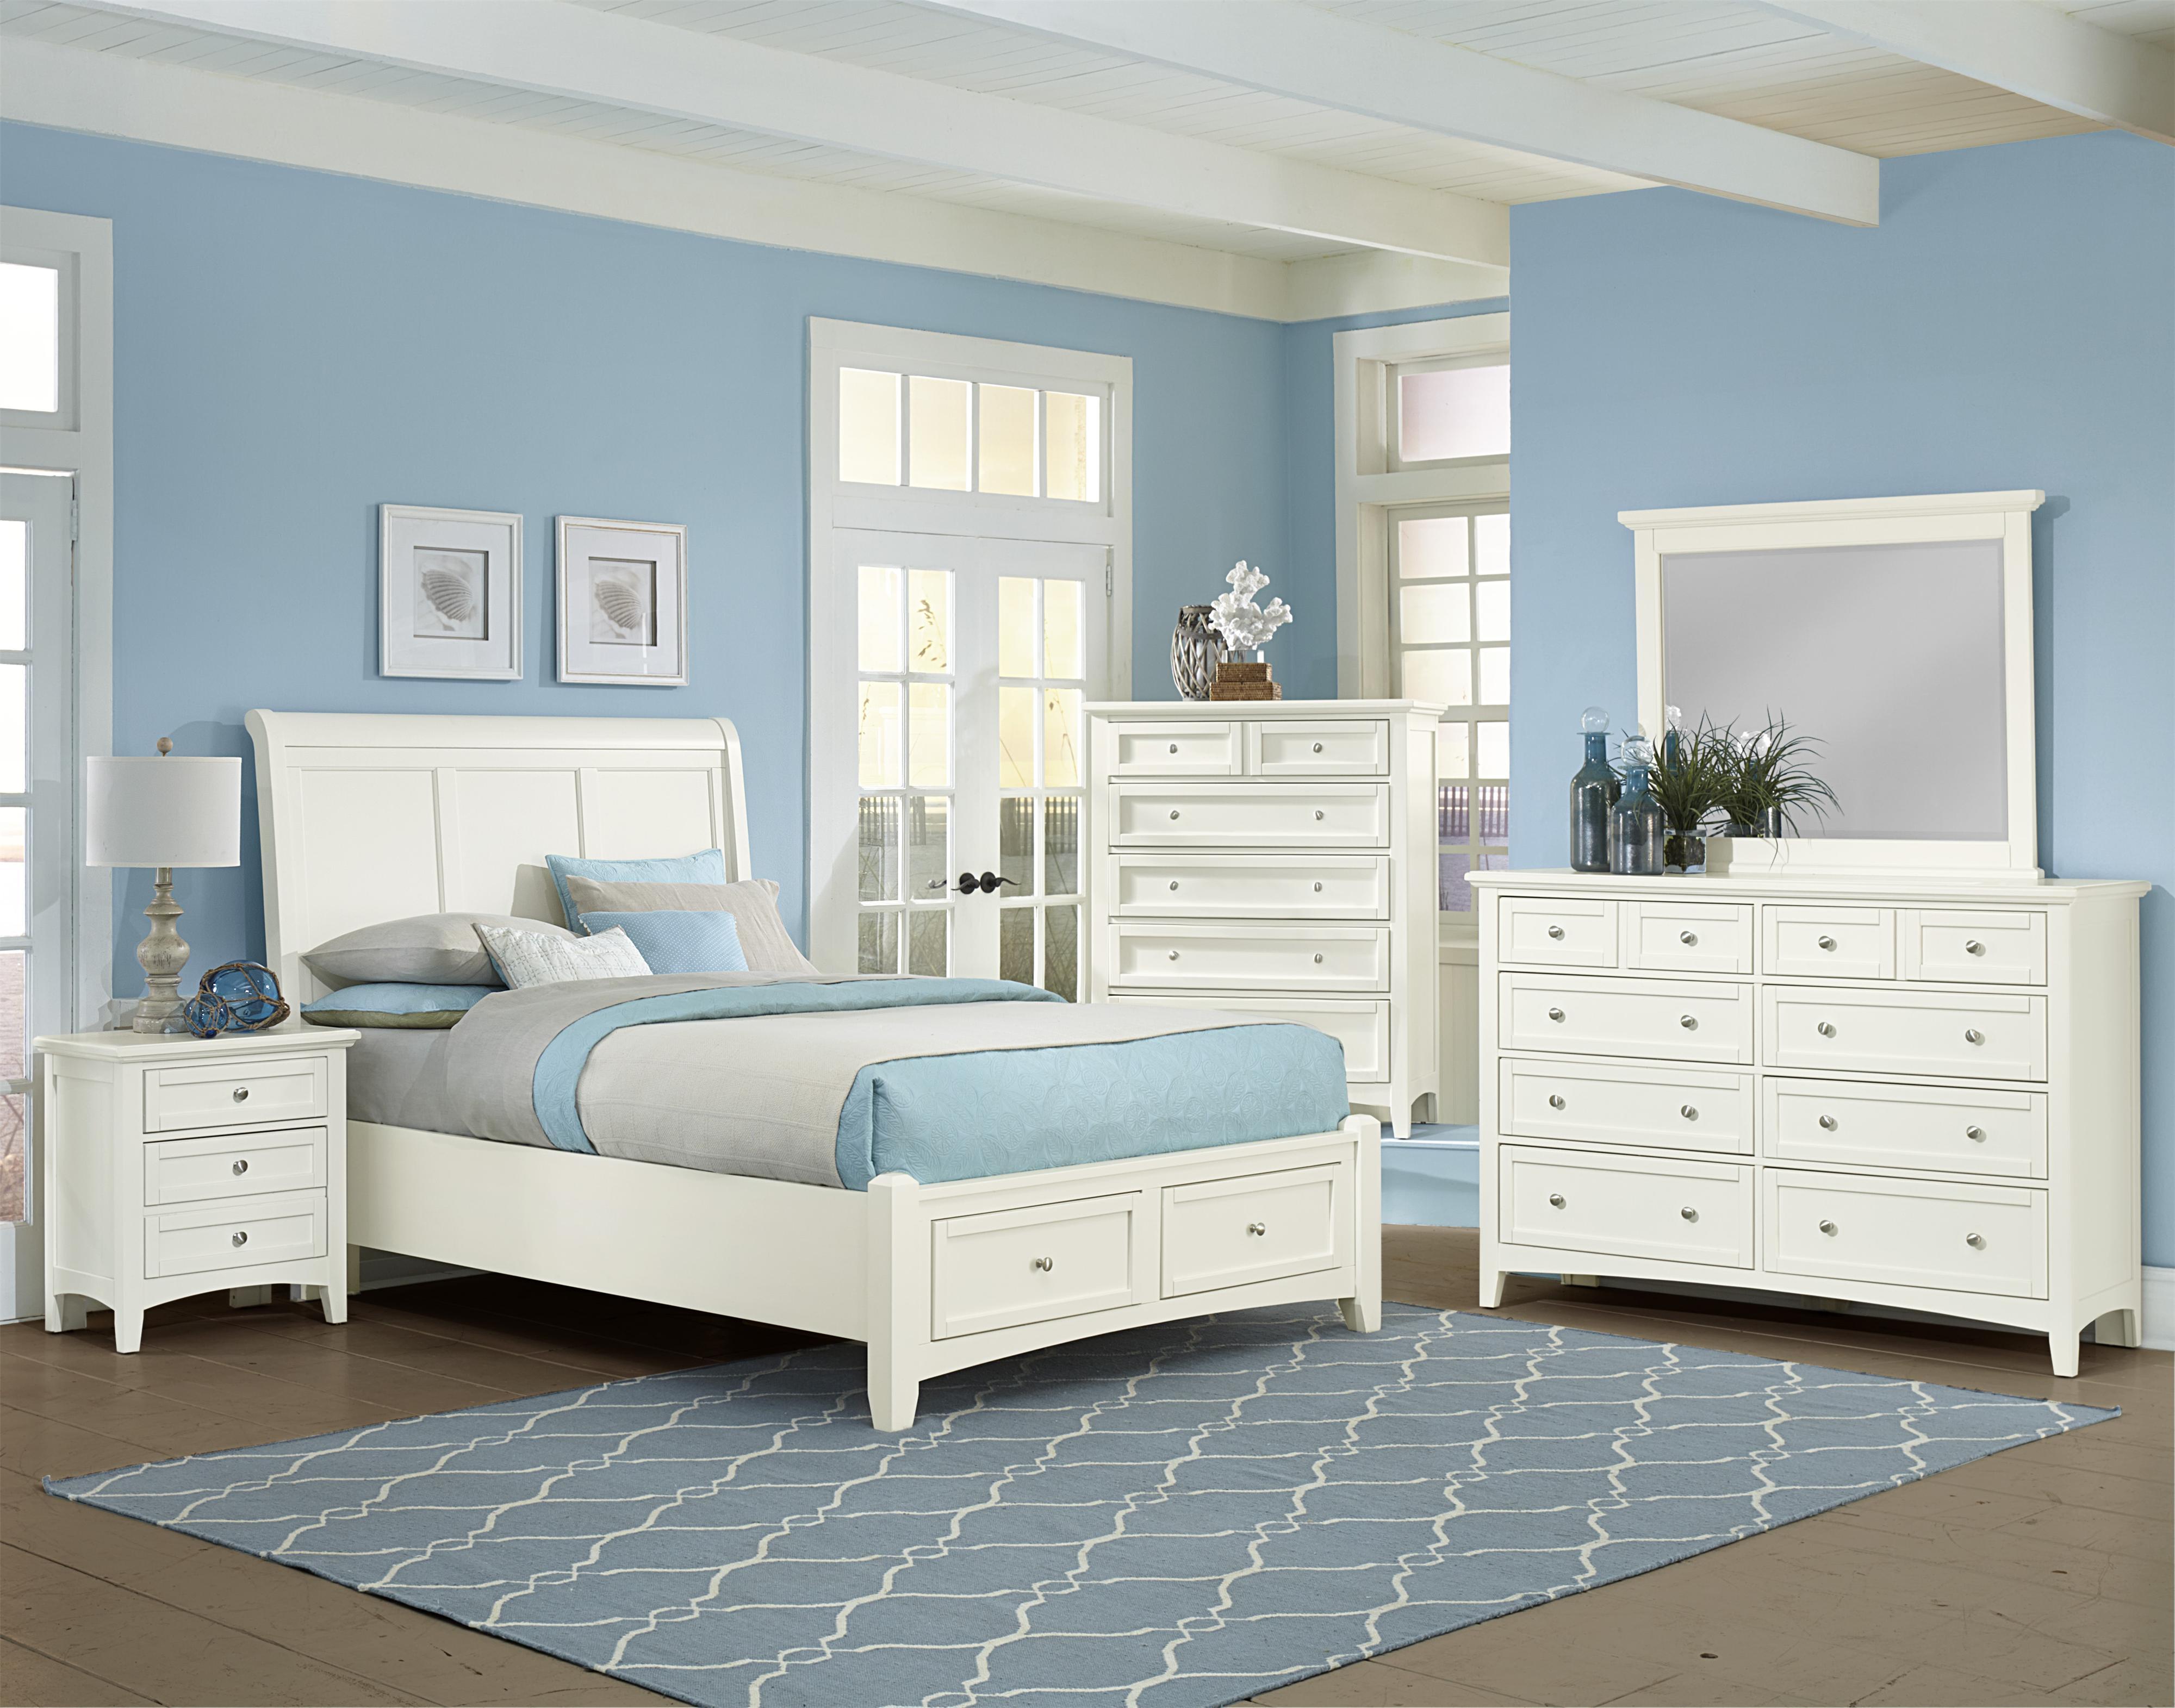 vaughan bassett bonanza king bedroom group olinde 39 s furniture bedroom groups. Black Bedroom Furniture Sets. Home Design Ideas